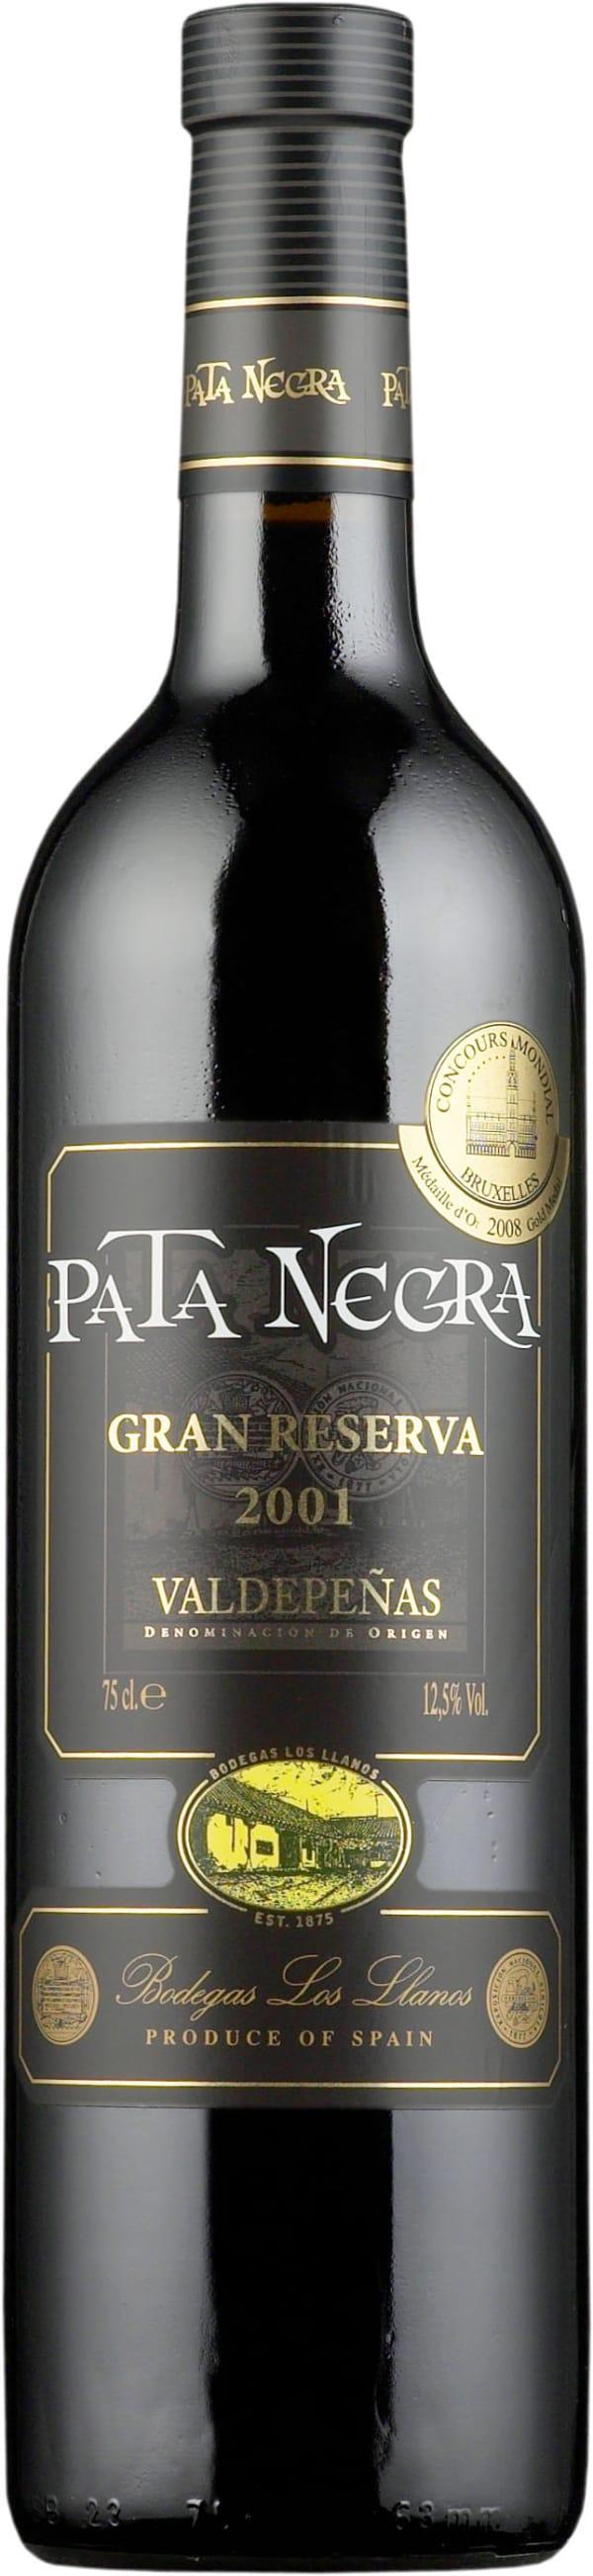 Pata Negra Gran Reserva 2008